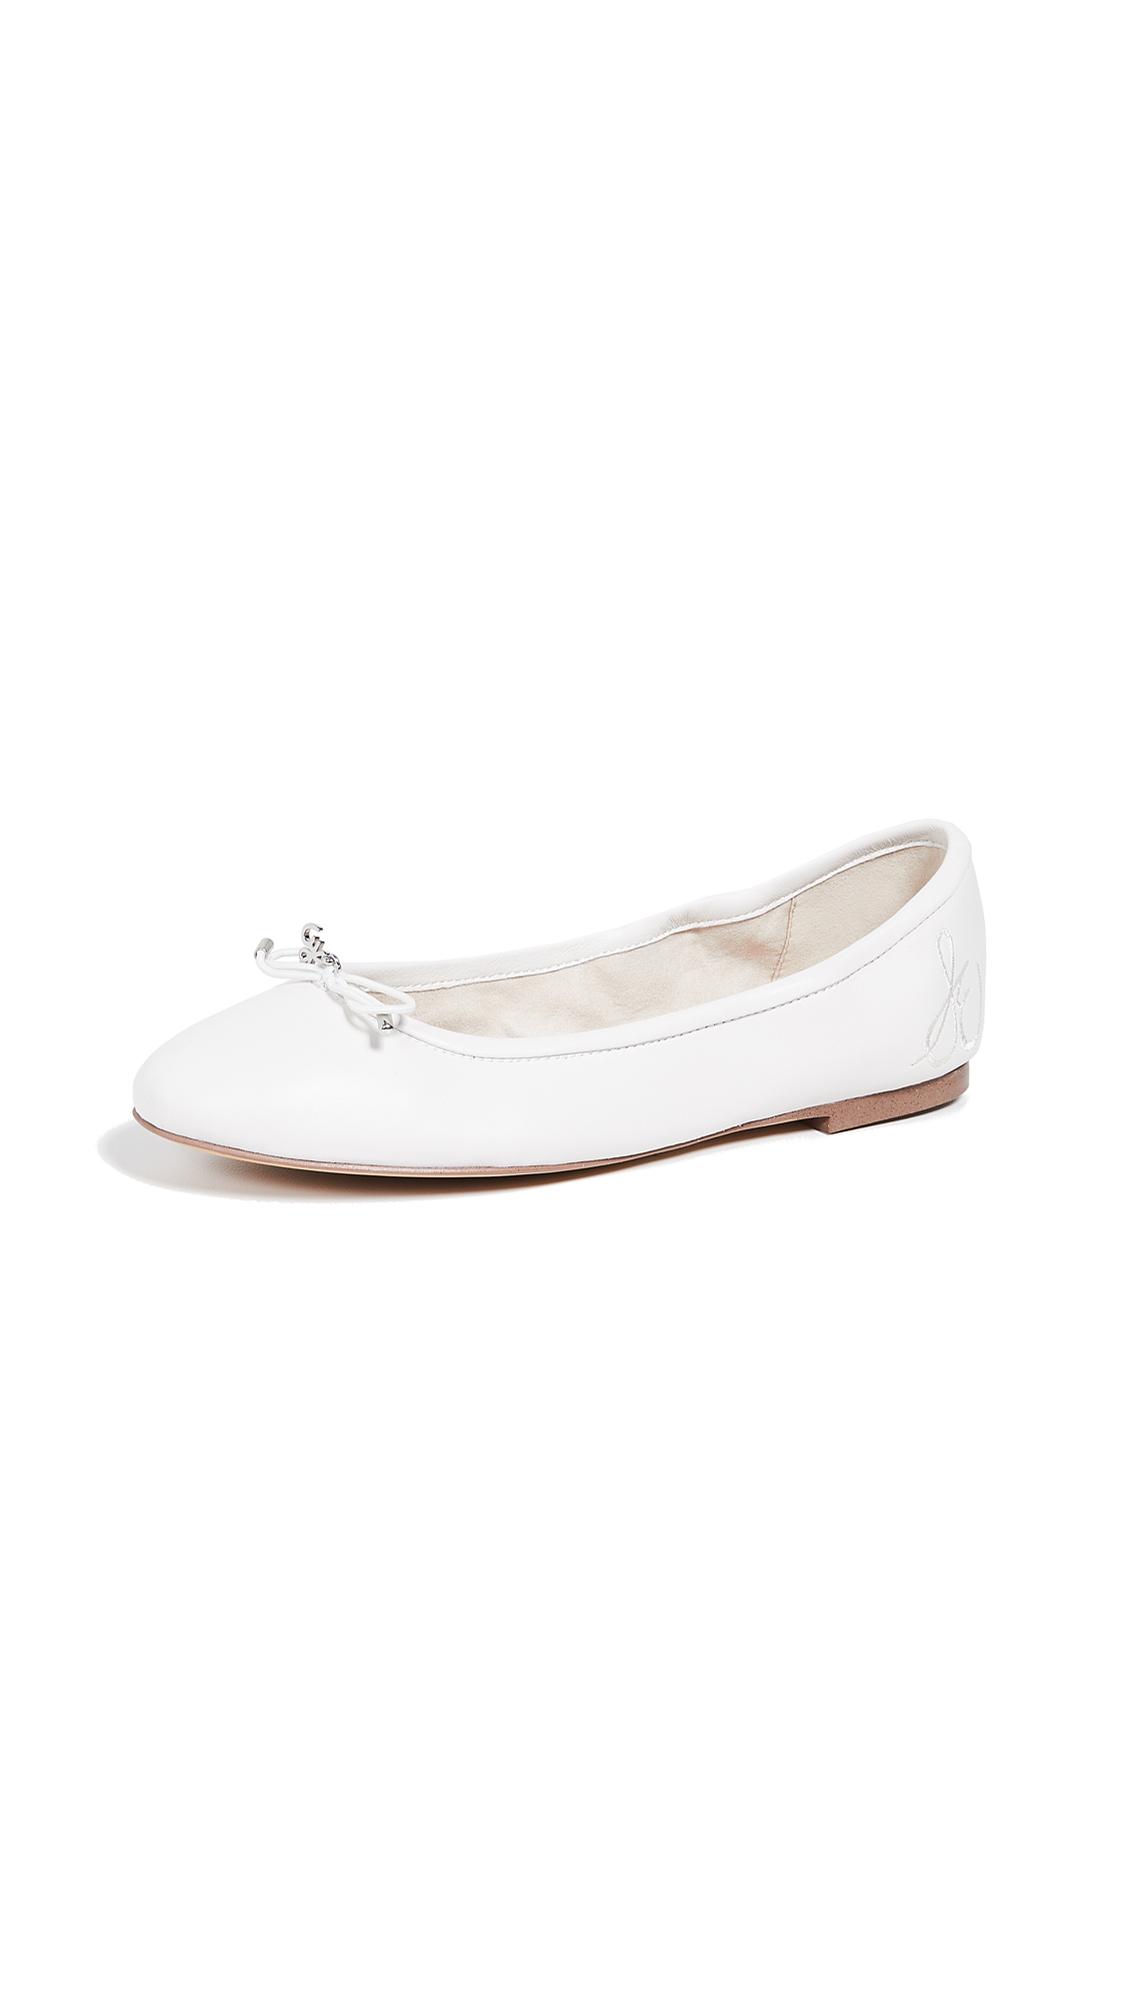 Buy Sam Edelman Felicia Flats online, shop Sam Edelman